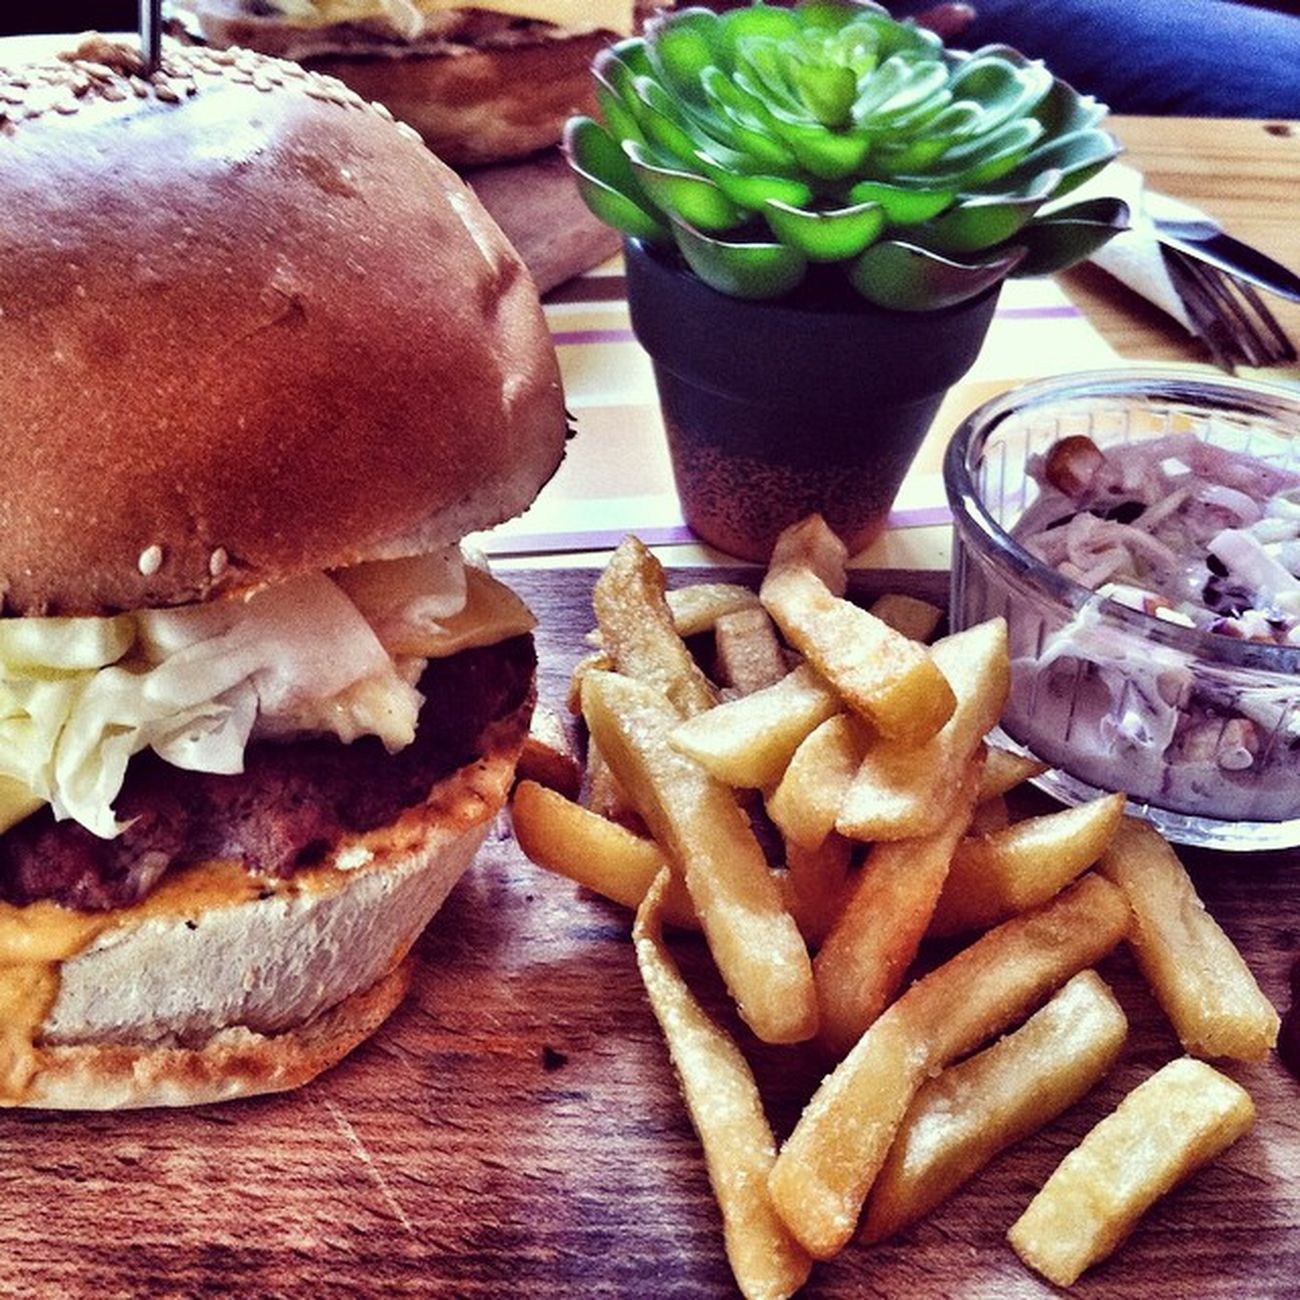 Food Burger Tunisia Tunis Rahj Chiken Instafood Igaddict Ilovetunisia InstaRahj Instagramtn IgersTunisia InstaBenna Topkapi Rahajna Tnshots Instagramertunisia Tnigers